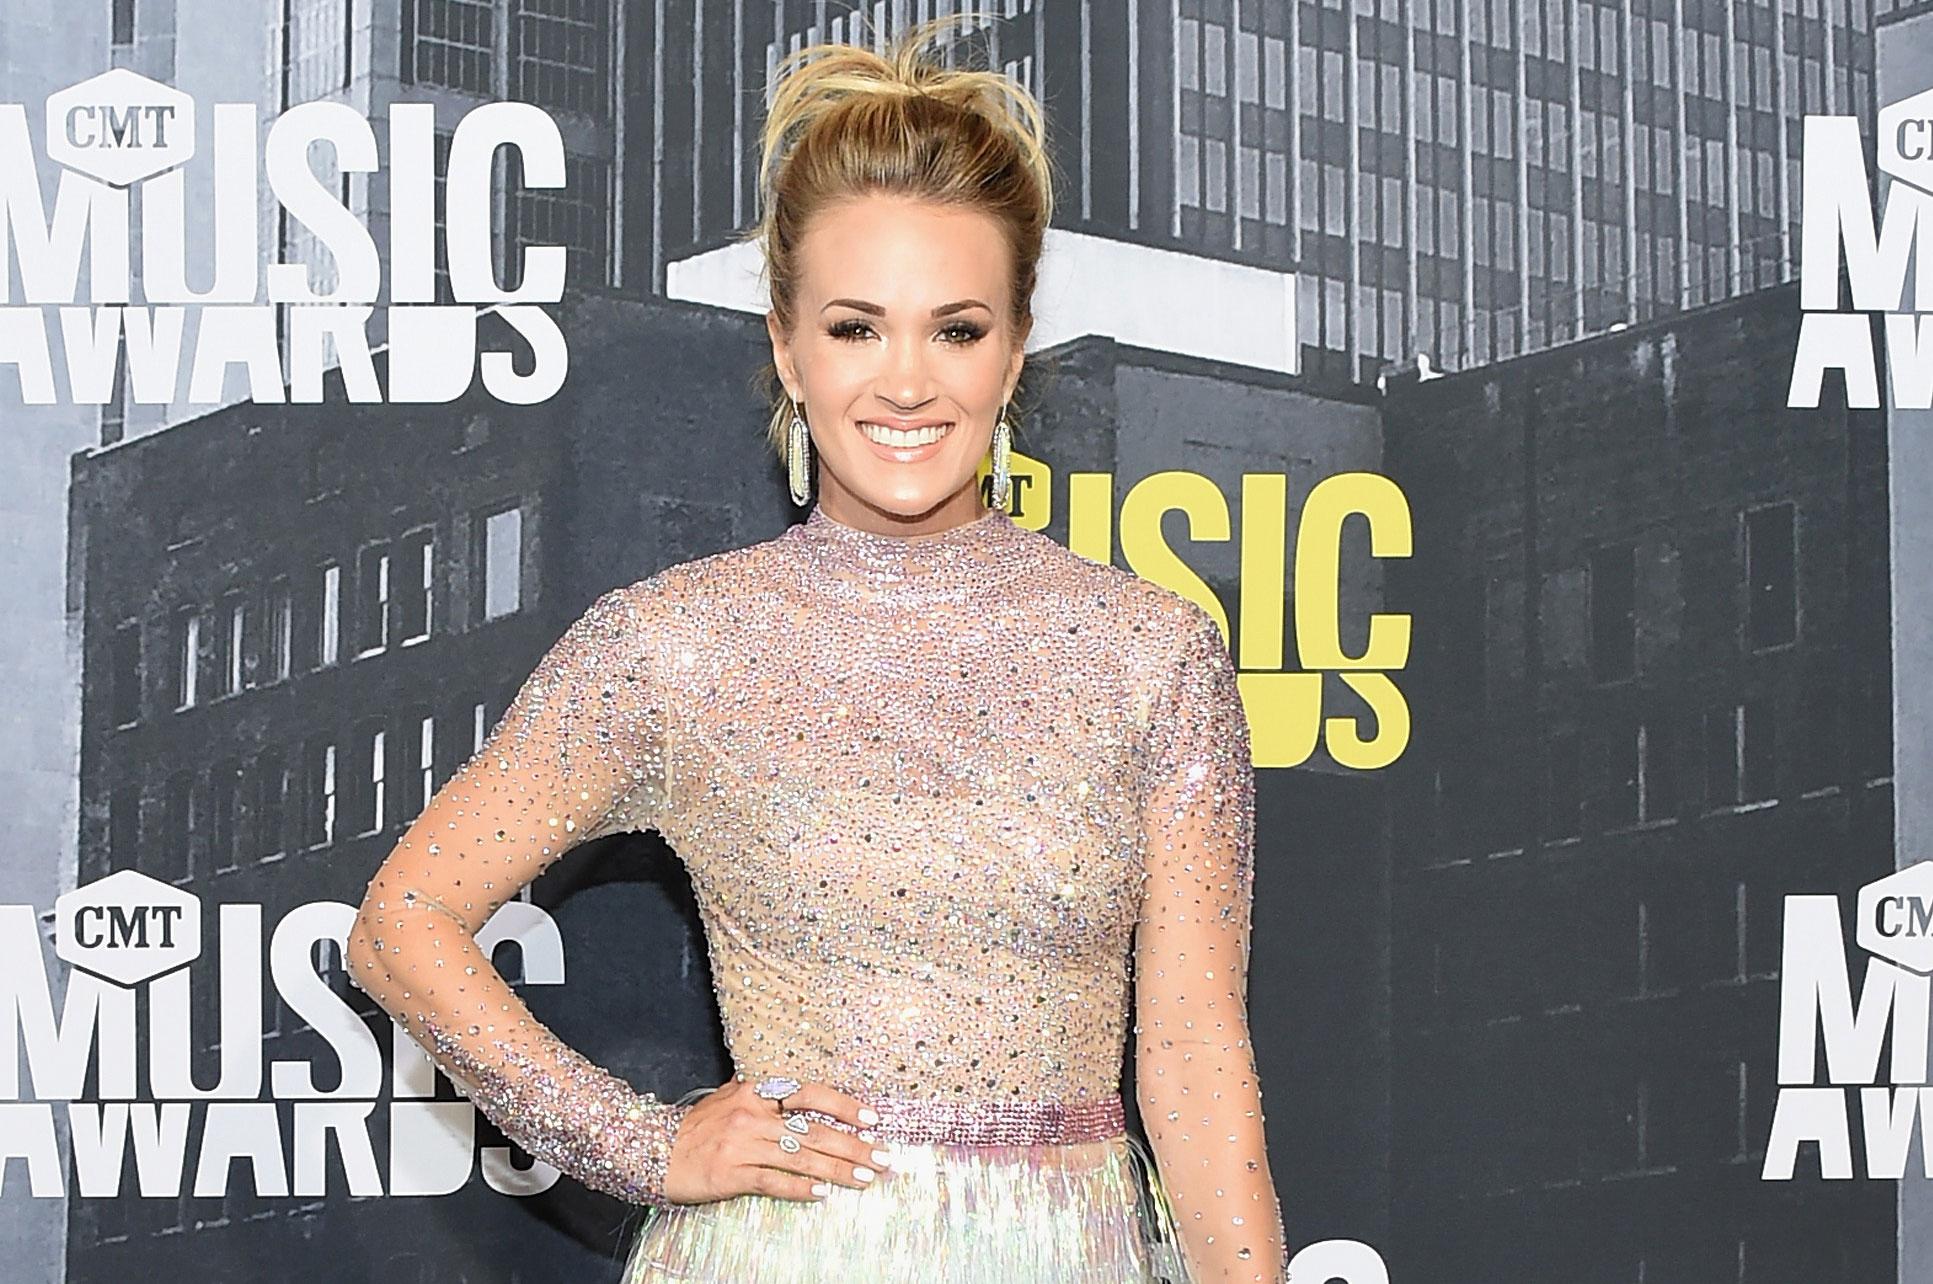 Carrie underwood pp